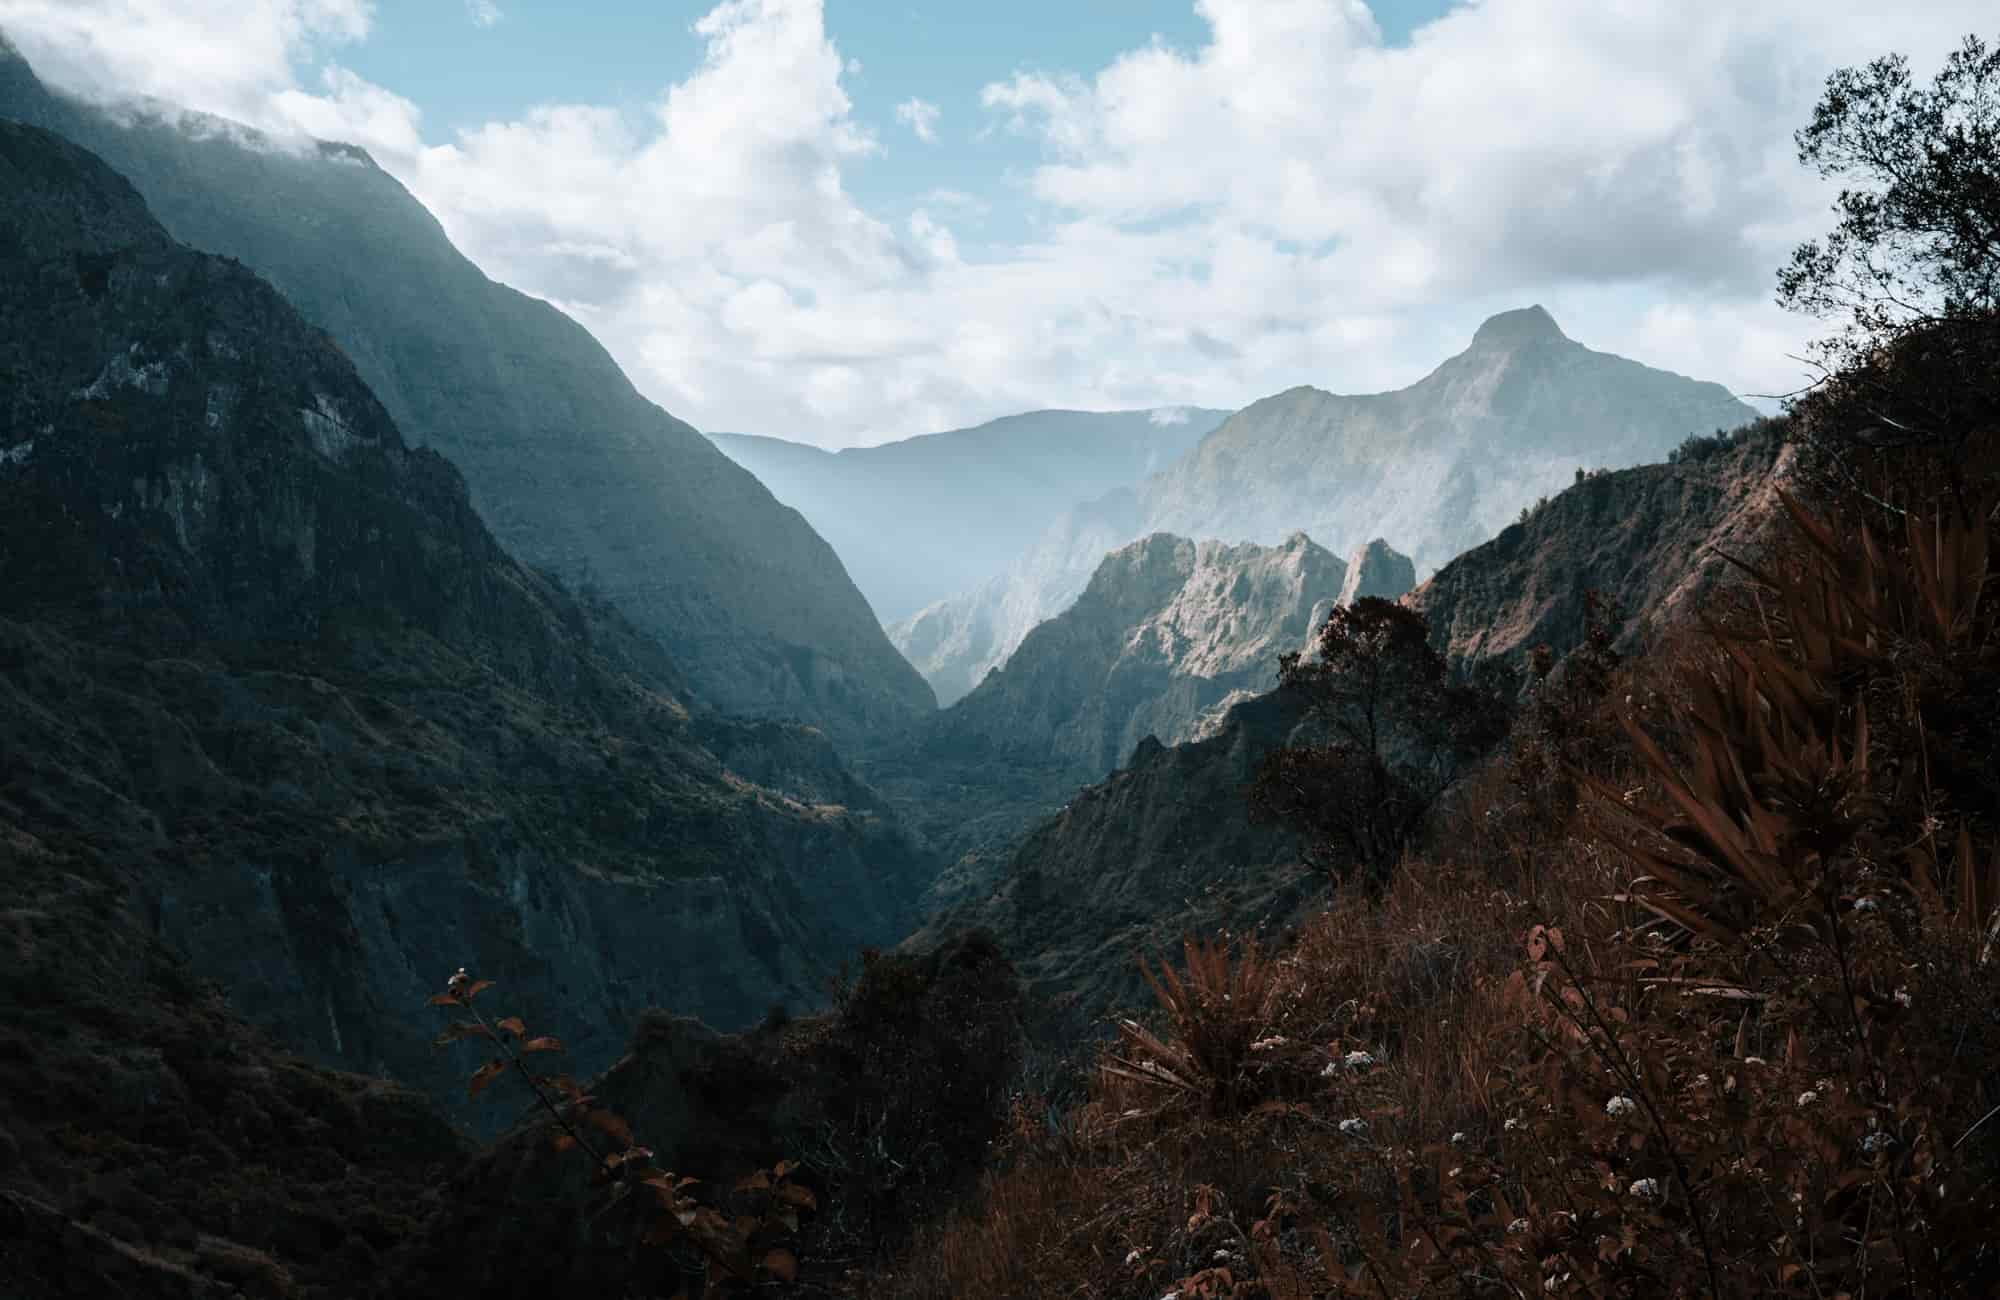 Voyage La Réunion - cirque Mafate - Amplitudes